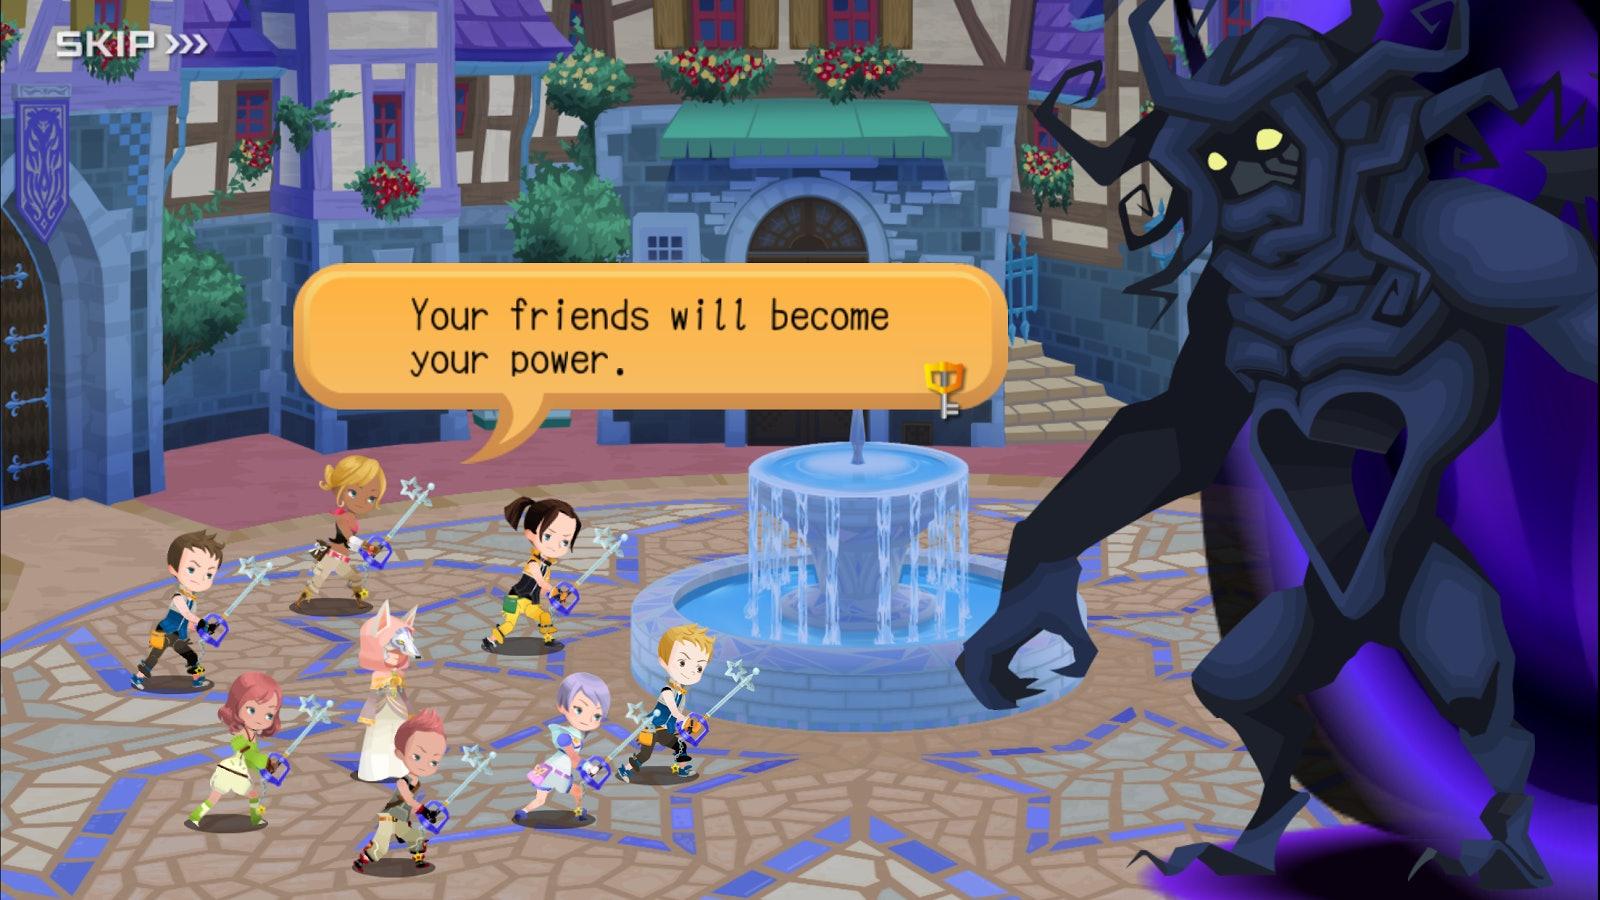 4a5b1711df70 'Kingdom Hearts 3' Plot Guide: We explain the story so far. '